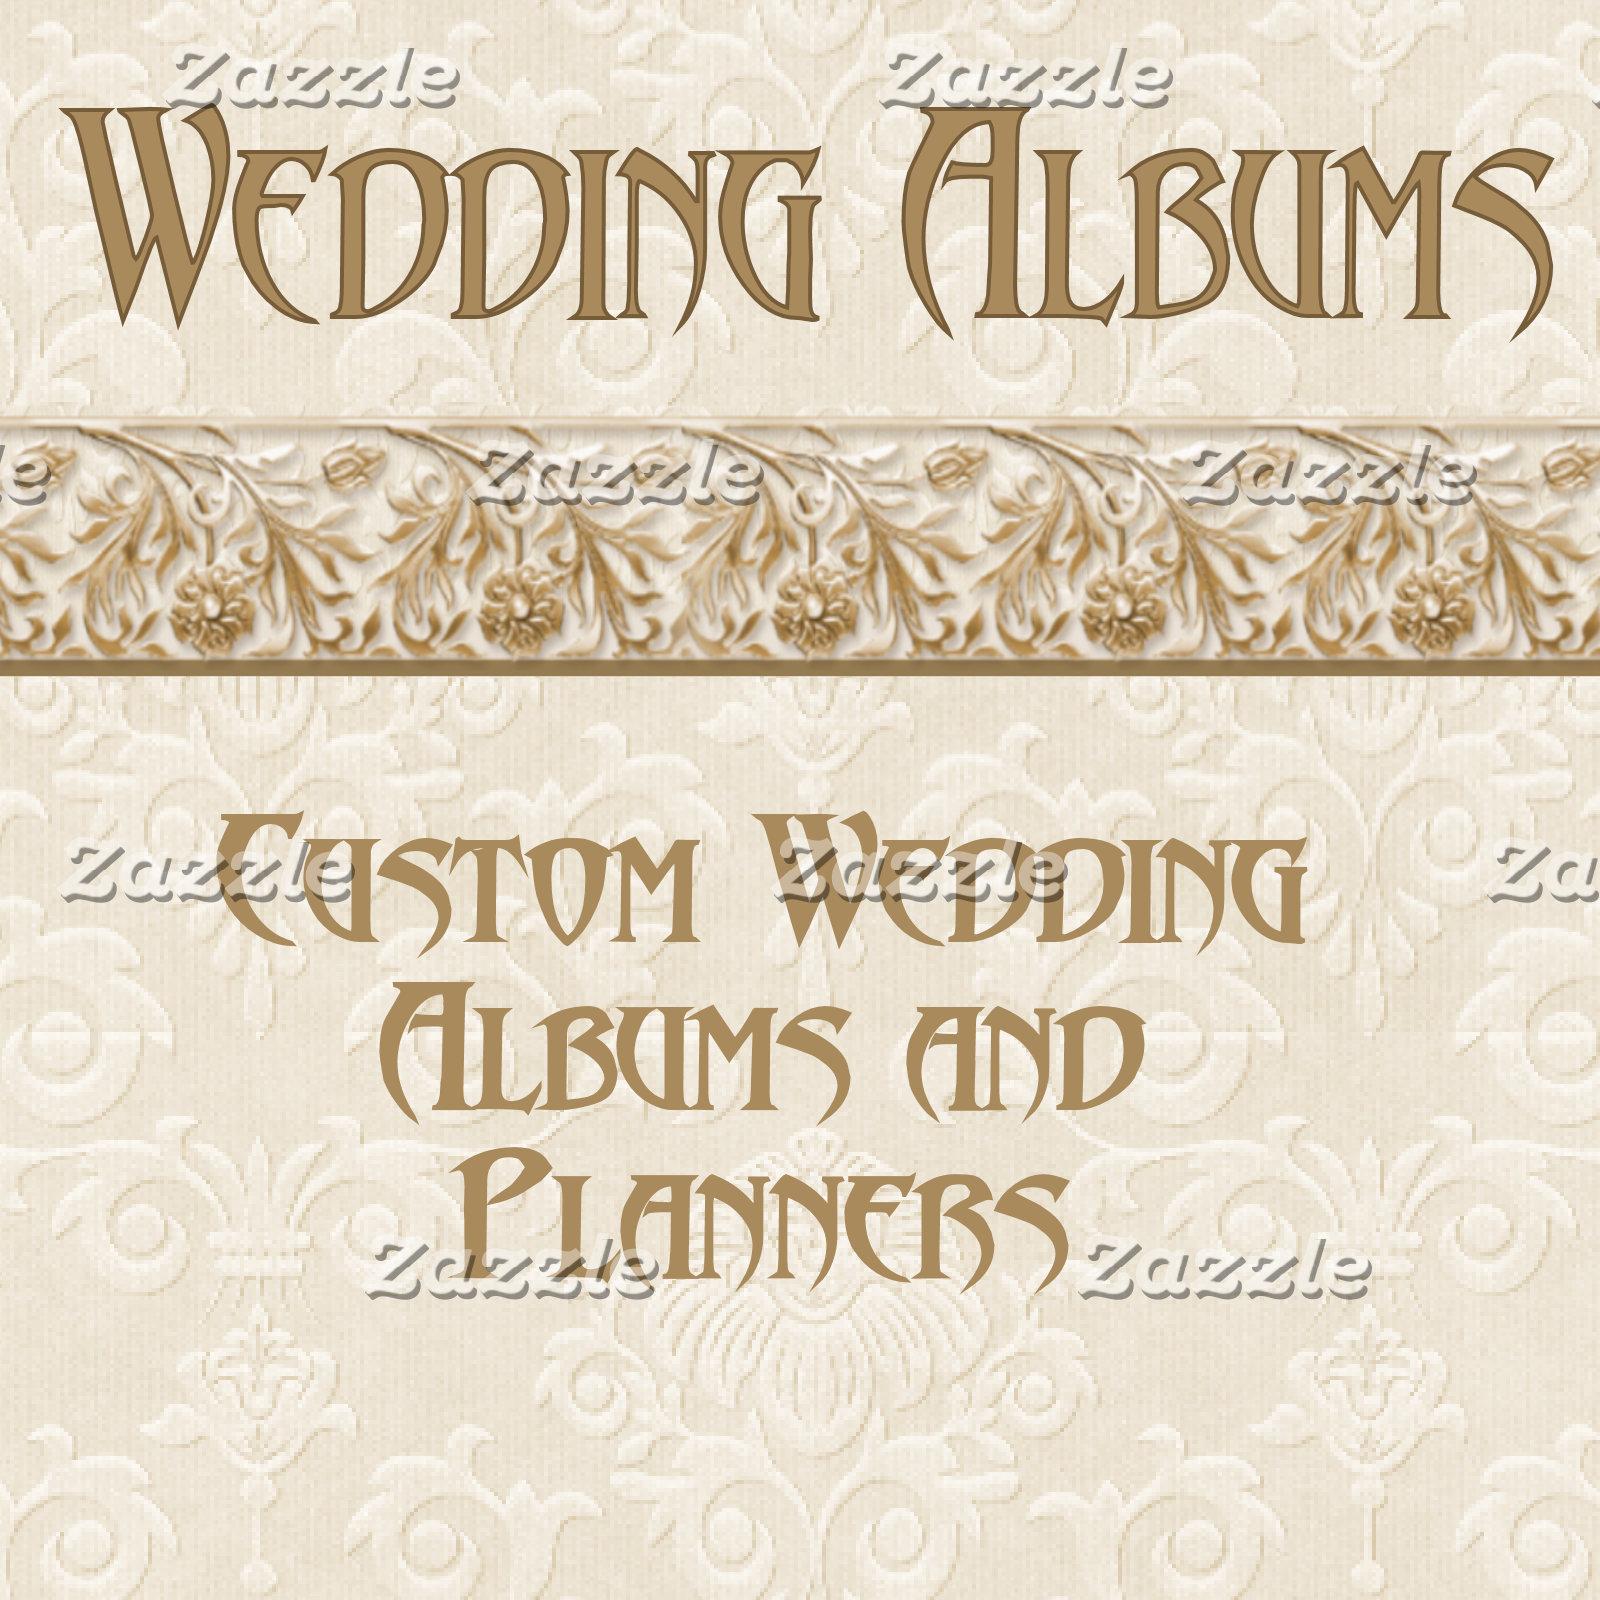 4.WEDDING ALBUMS